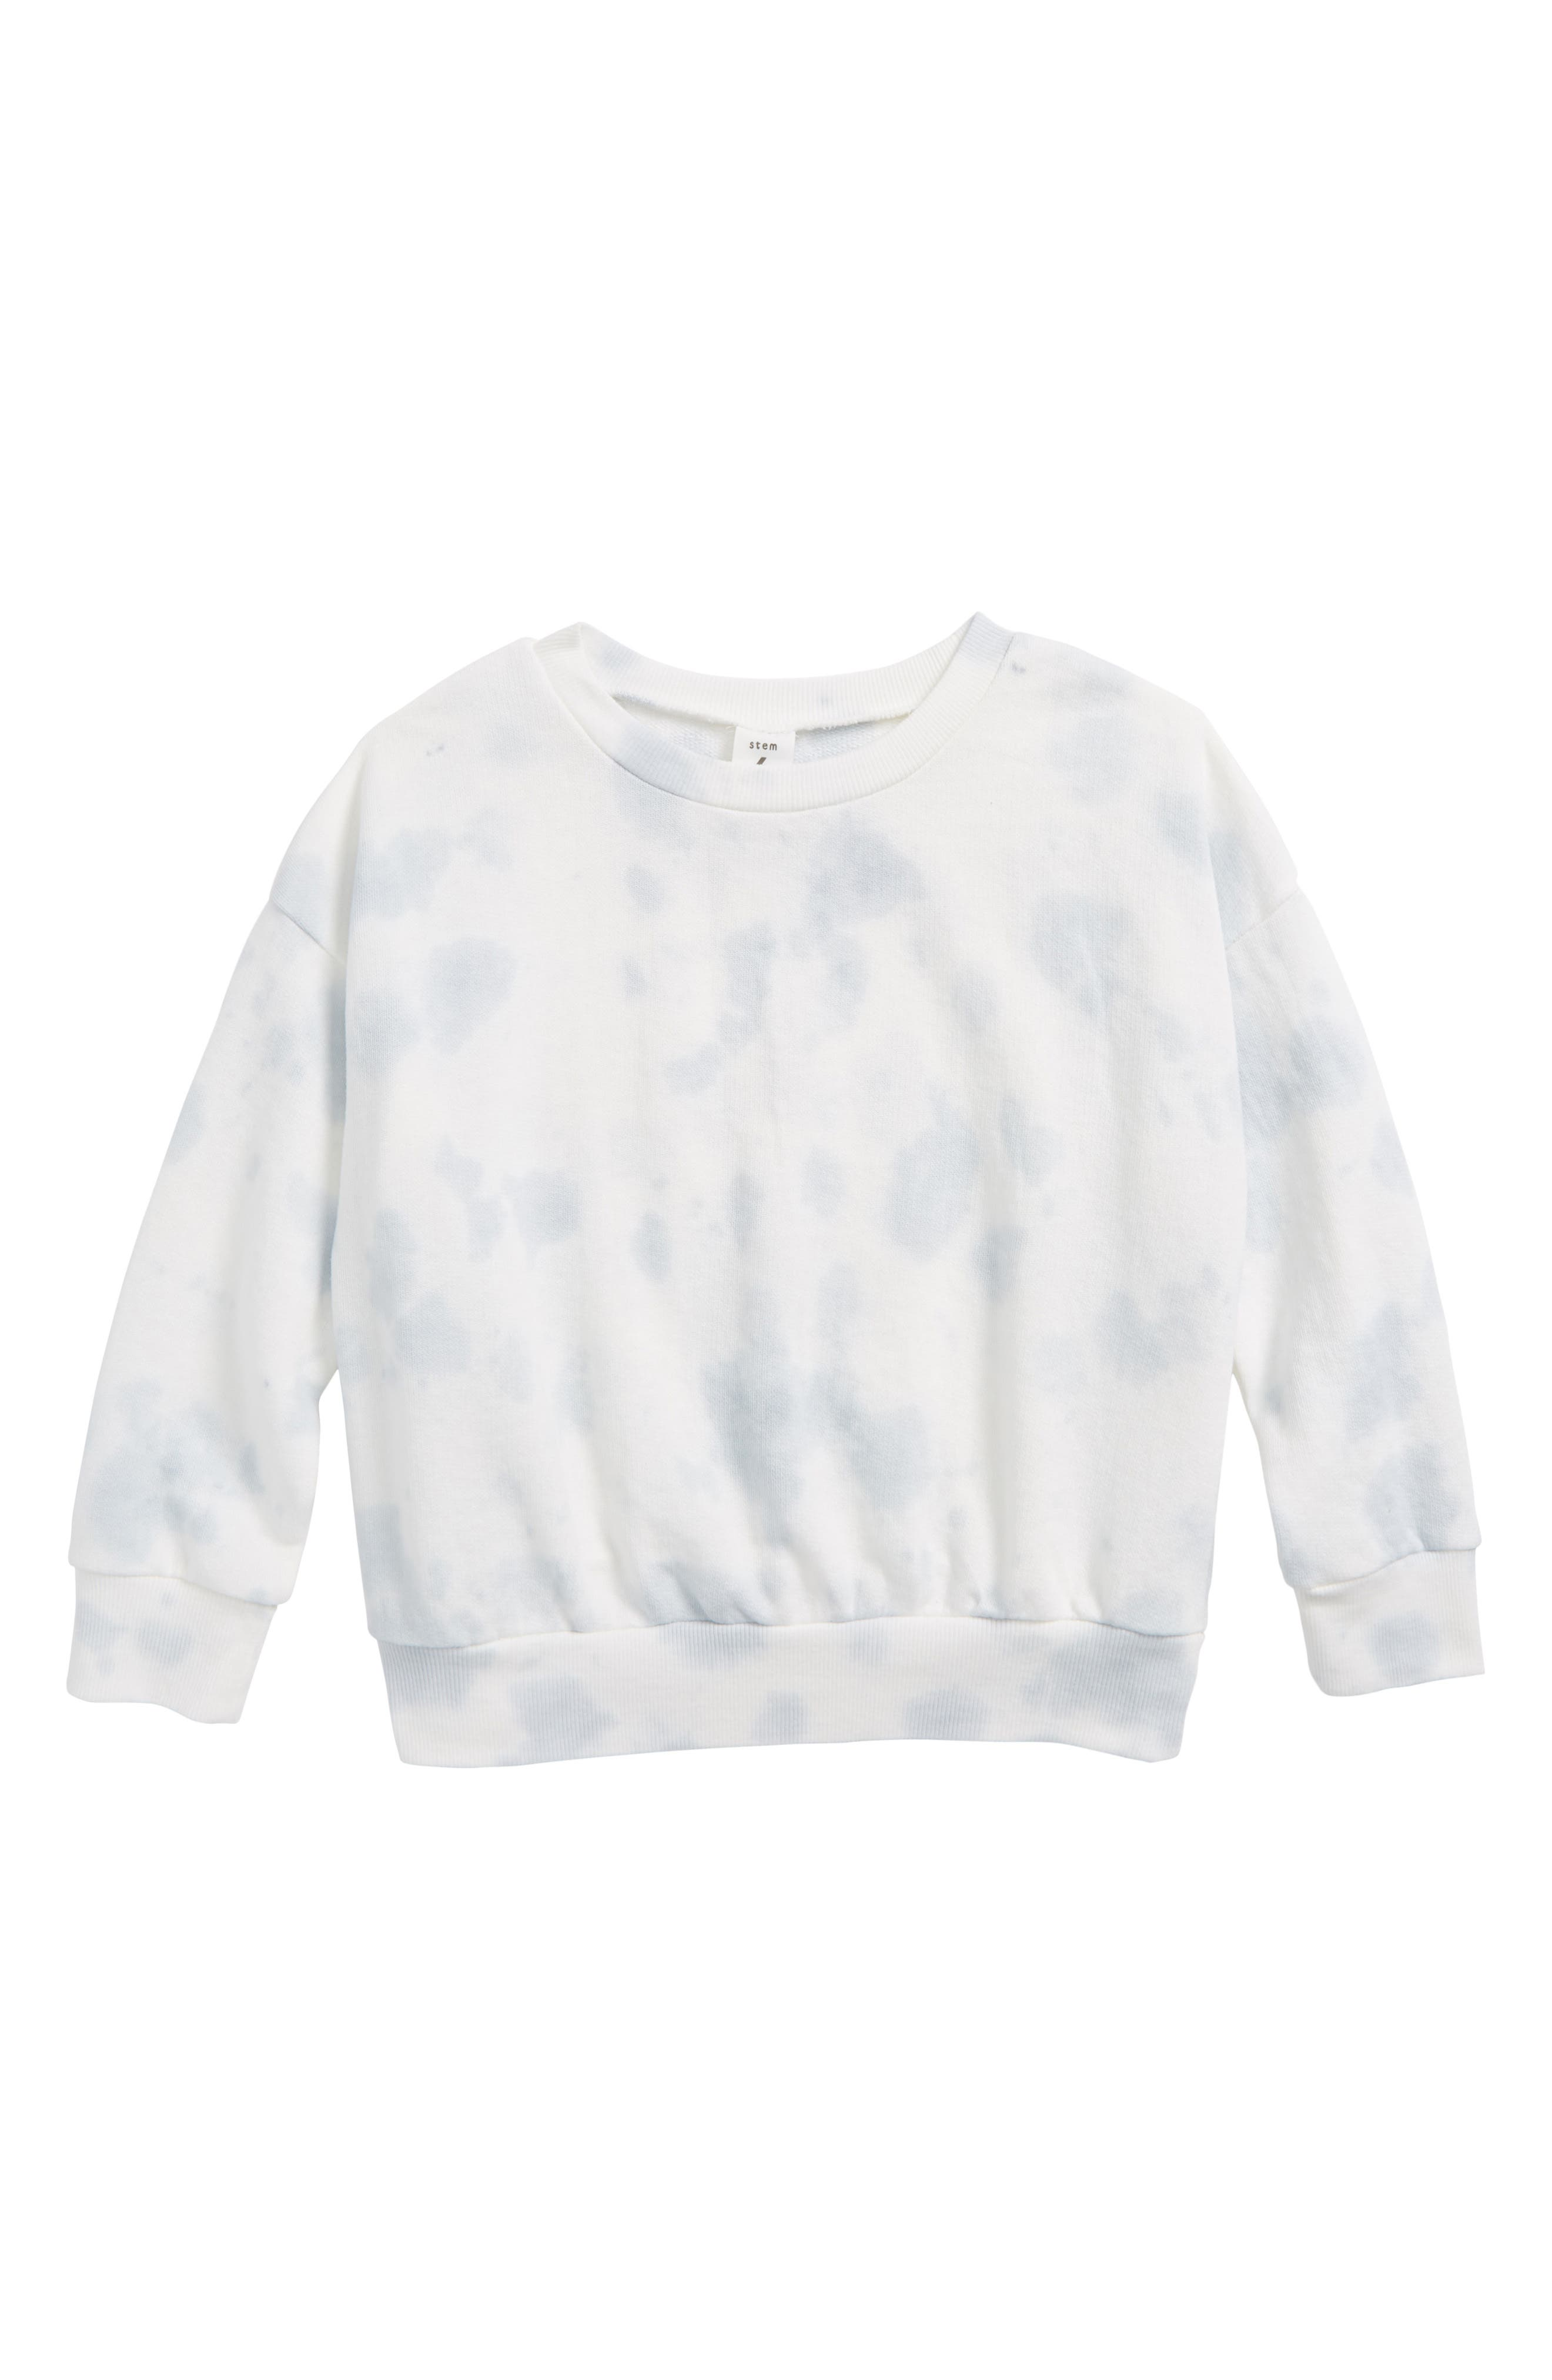 Tie Dye Sweatshirt,                             Main thumbnail 1, color,                             Blue Fog Tie Dye